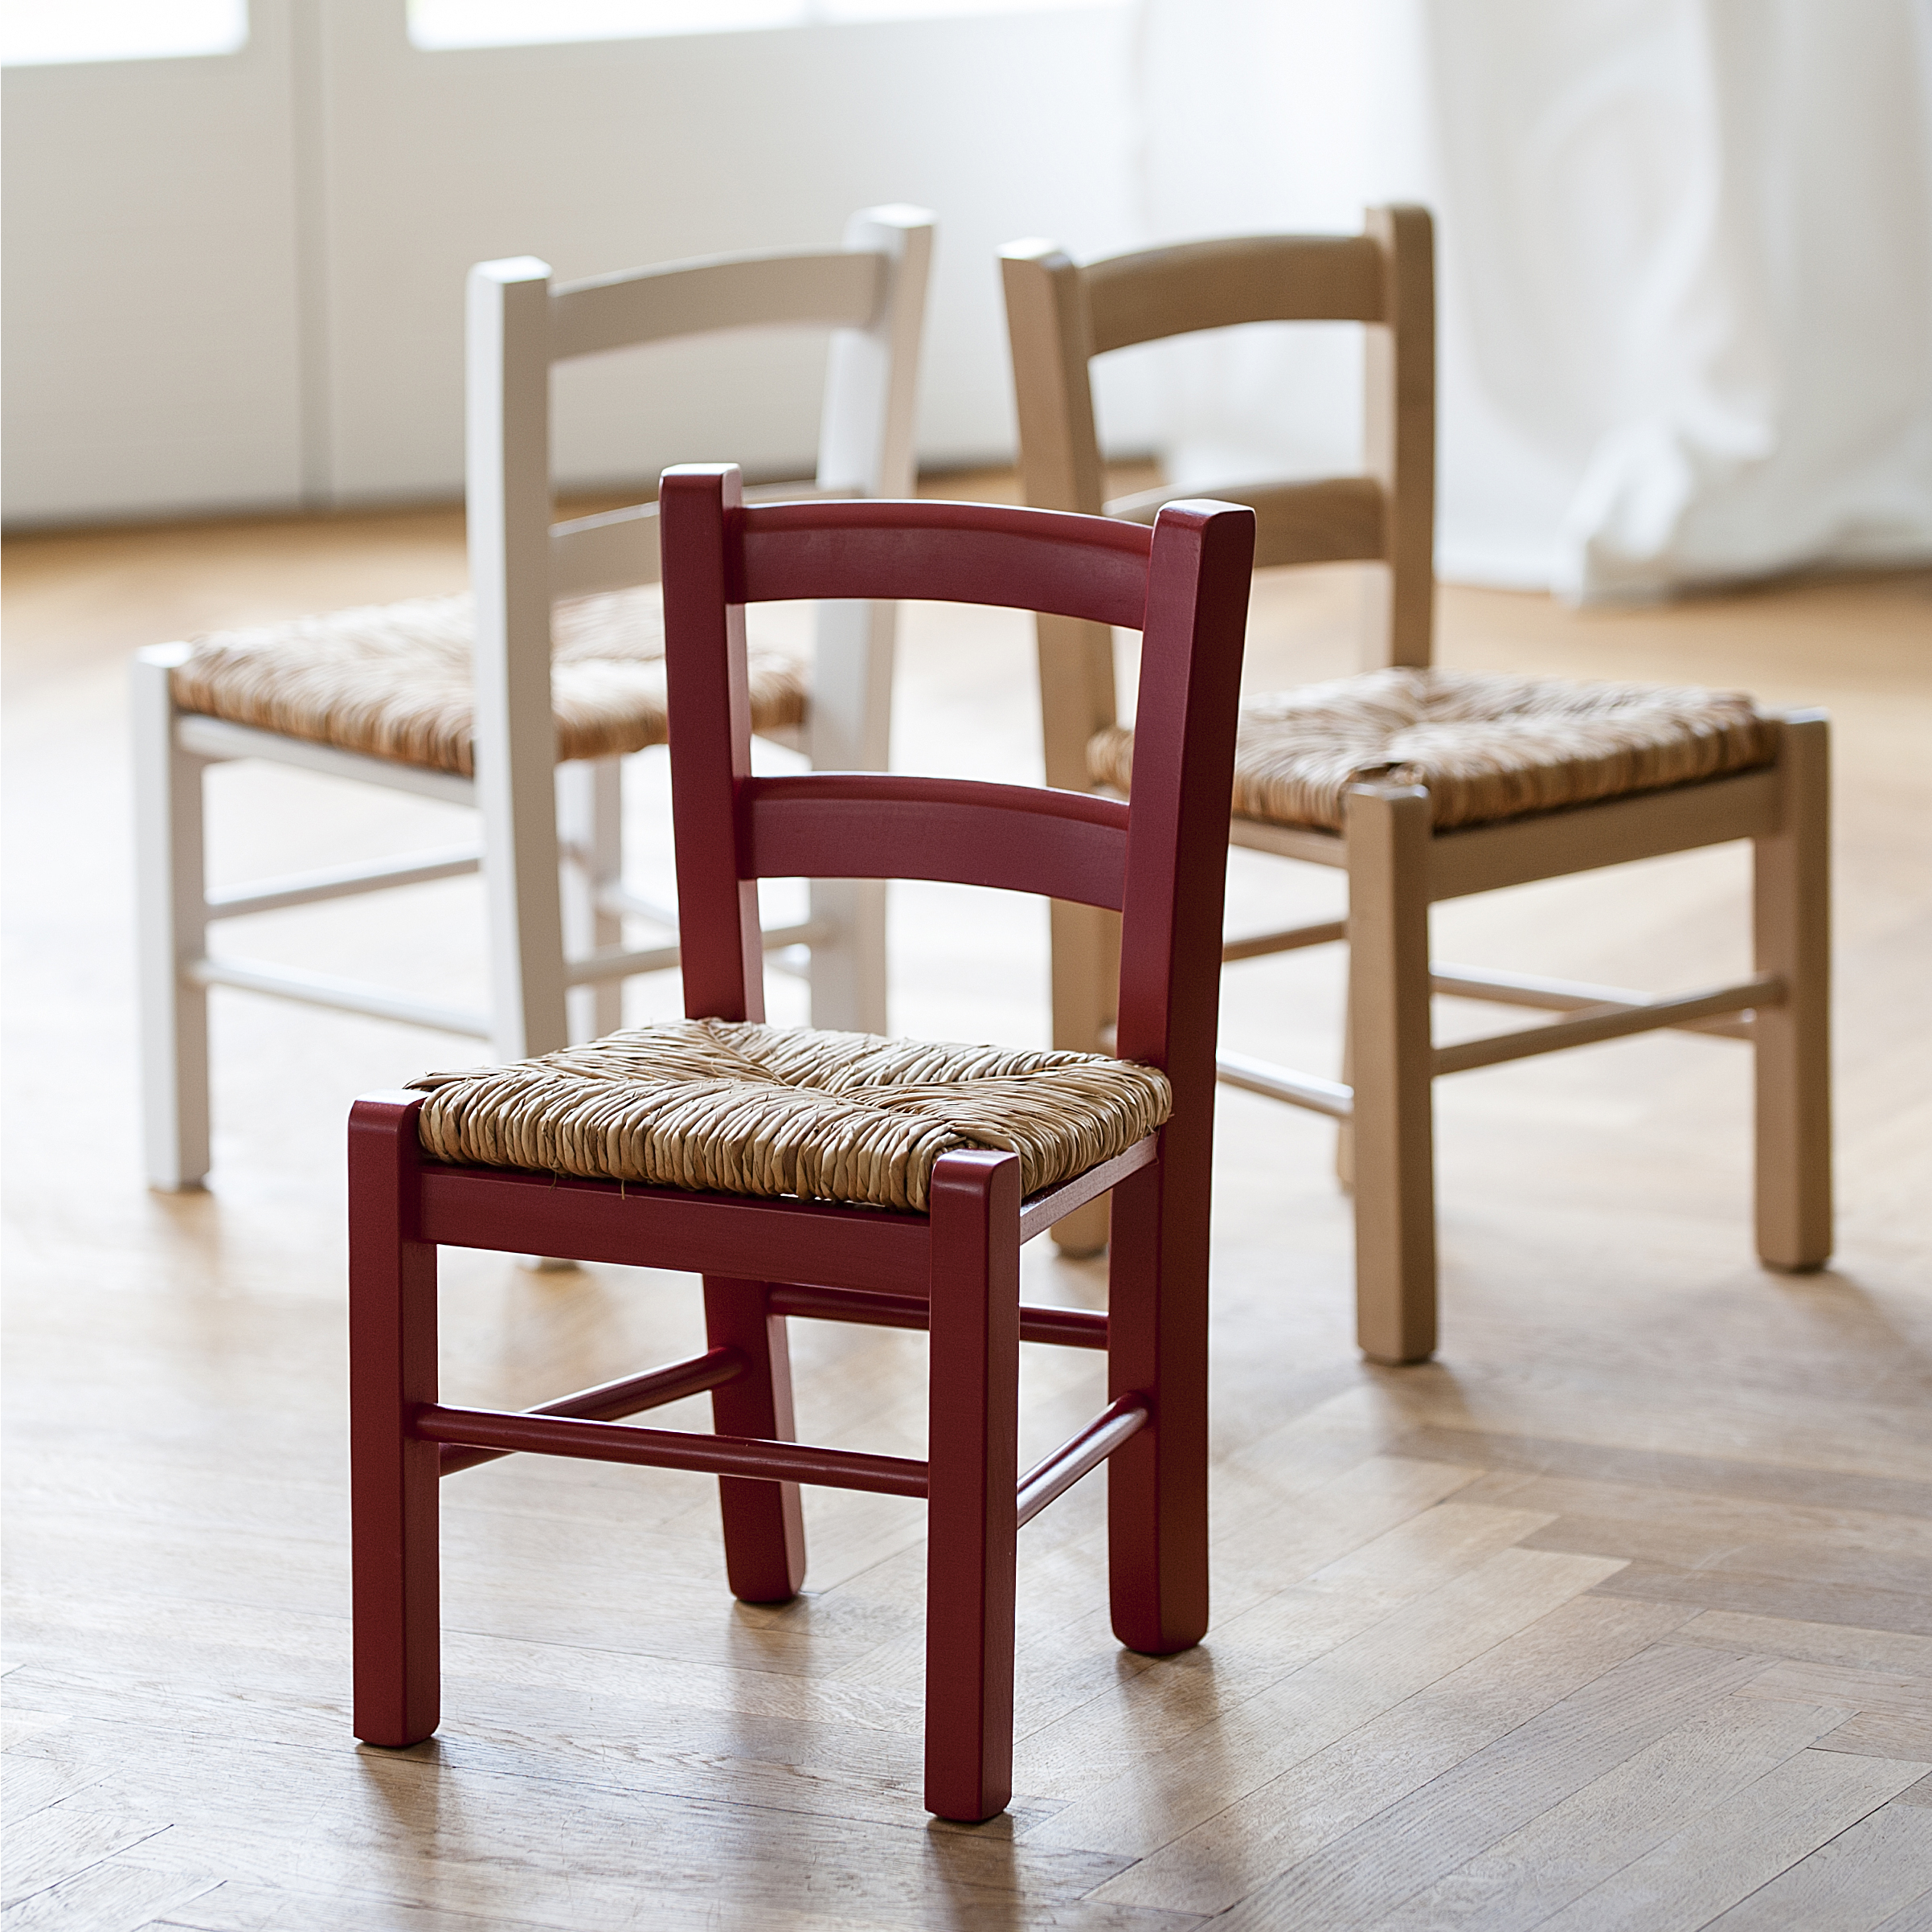 binsen kinderstuhl bei. Black Bedroom Furniture Sets. Home Design Ideas